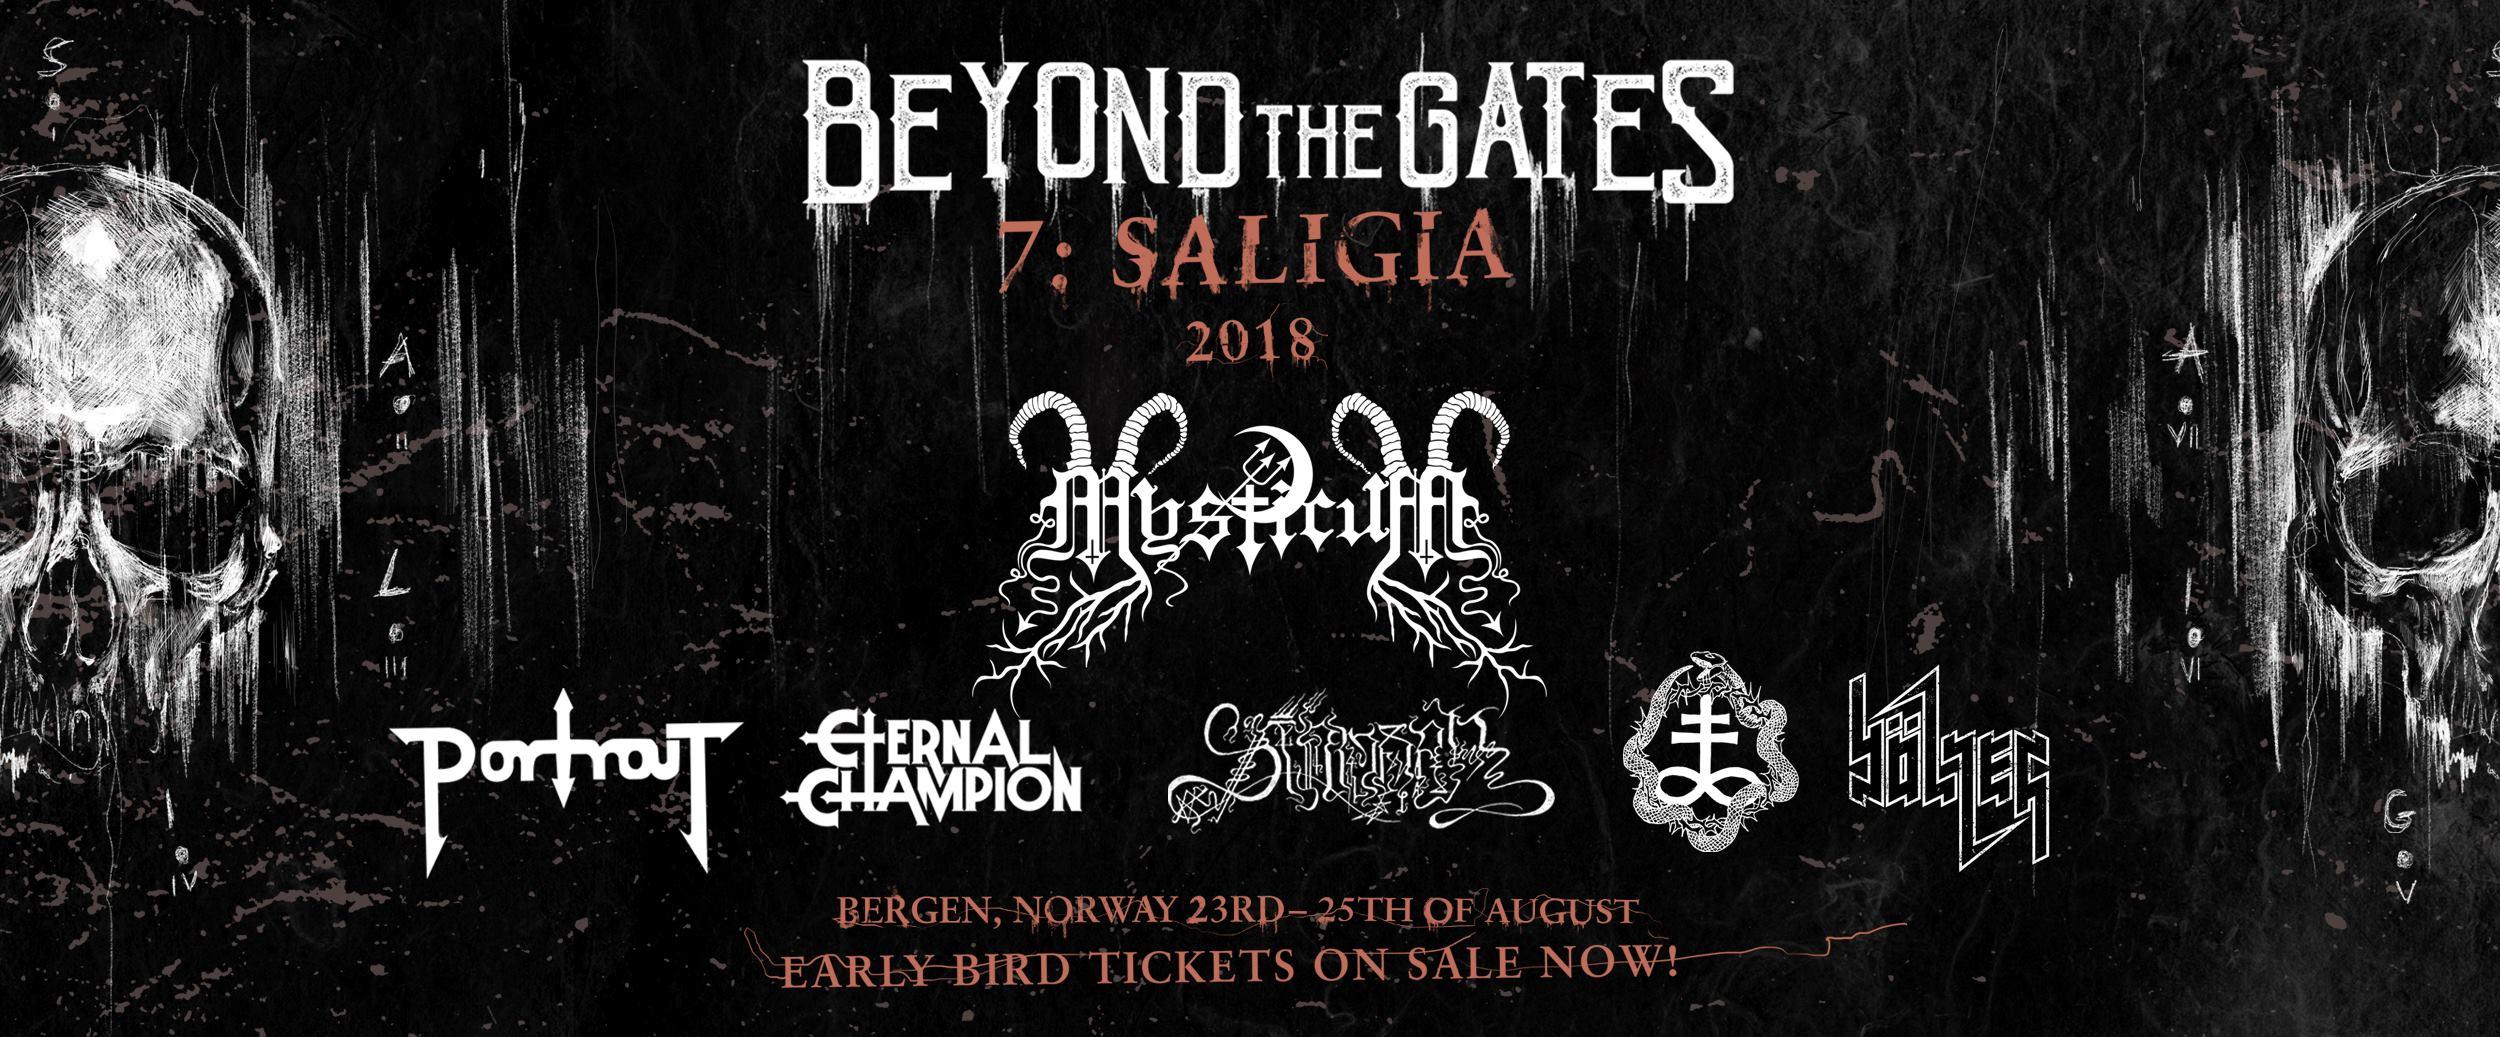 Beyond the Gates 2018